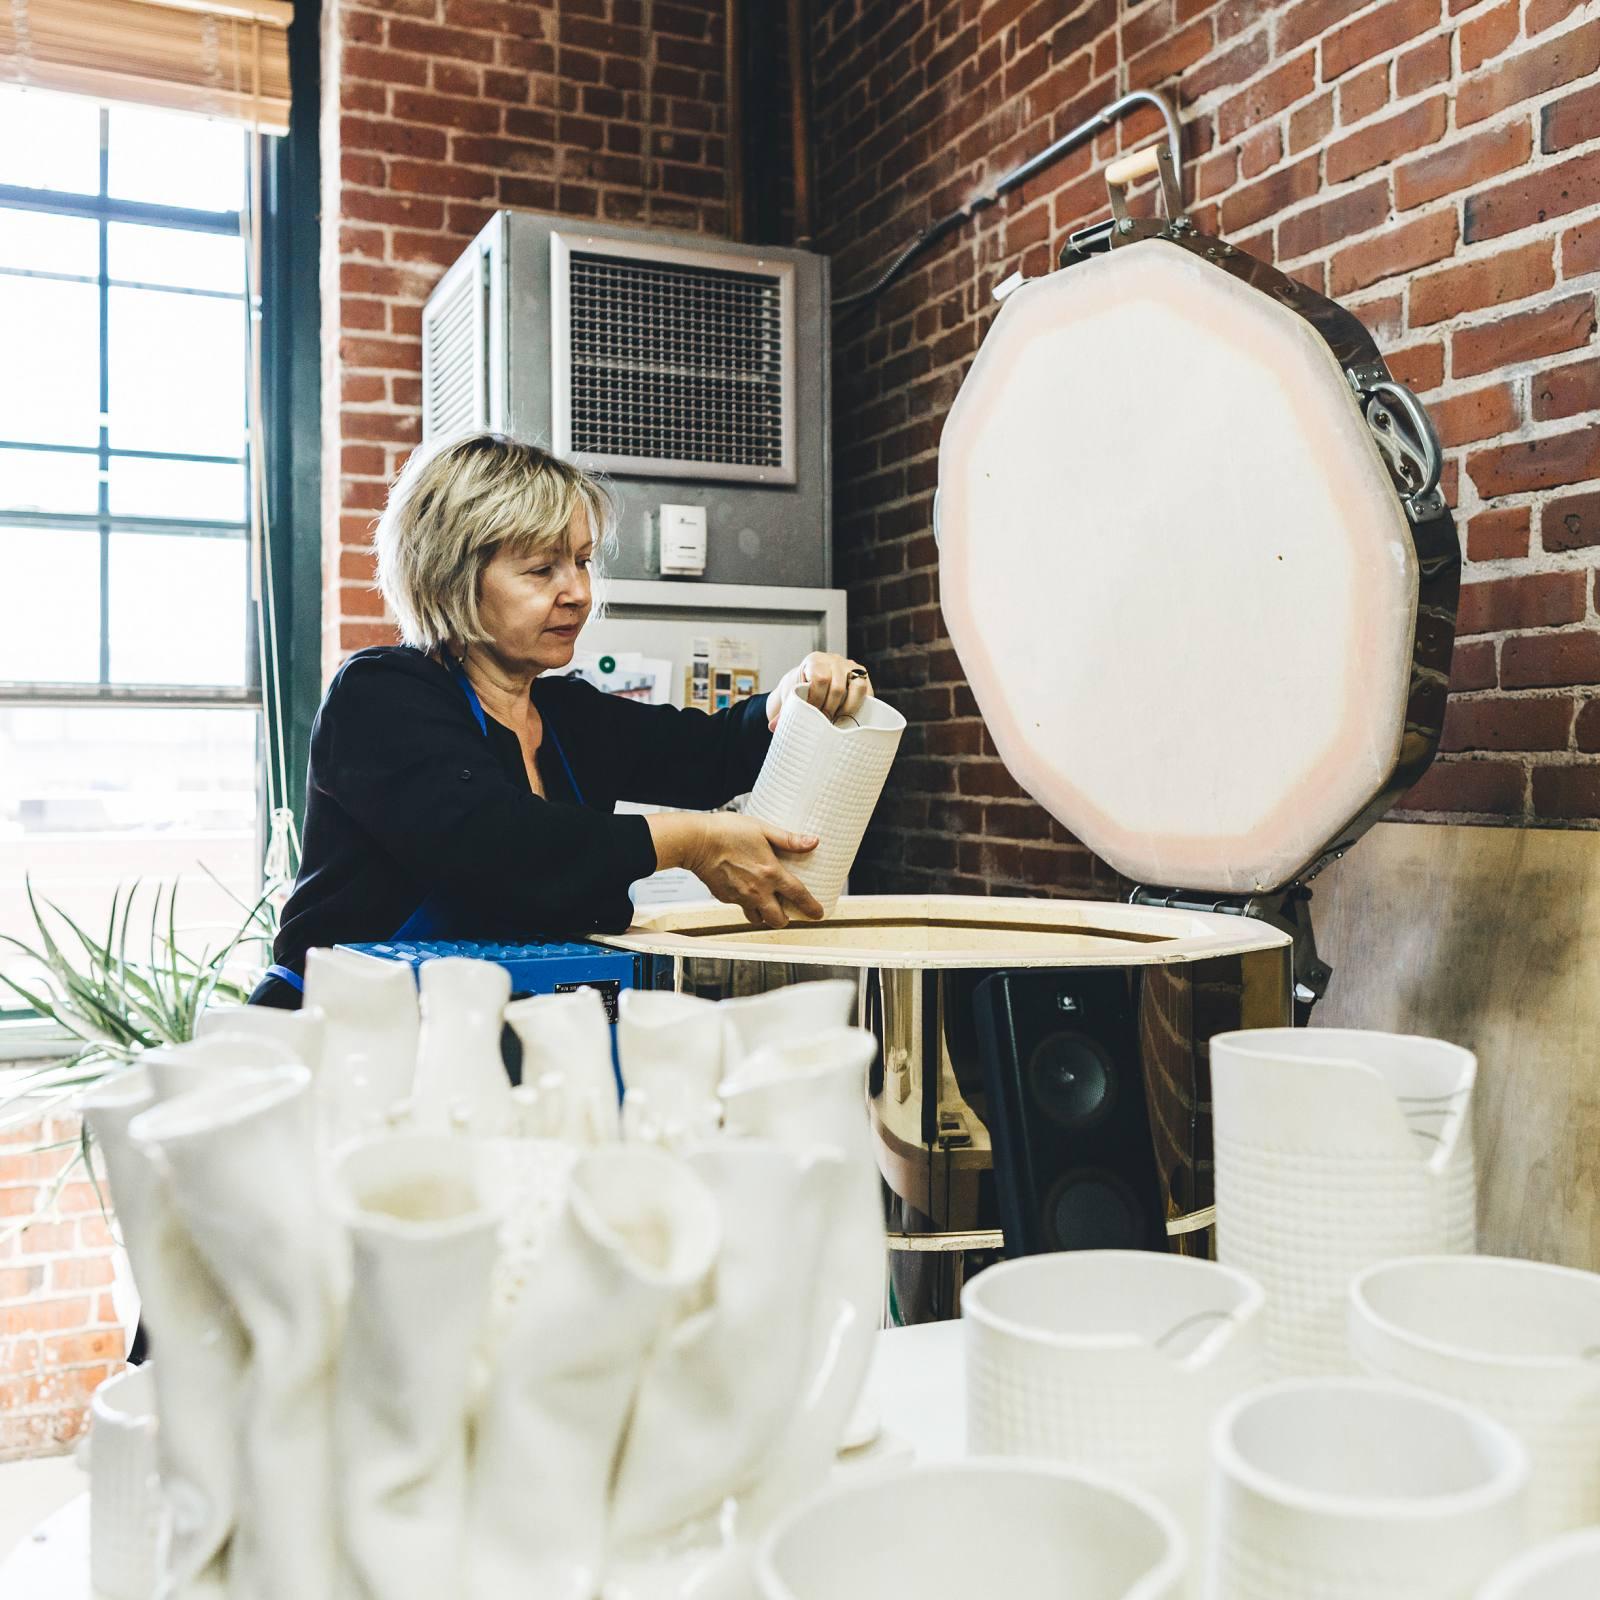 Liliana loading her kiln with ceramic pieces.